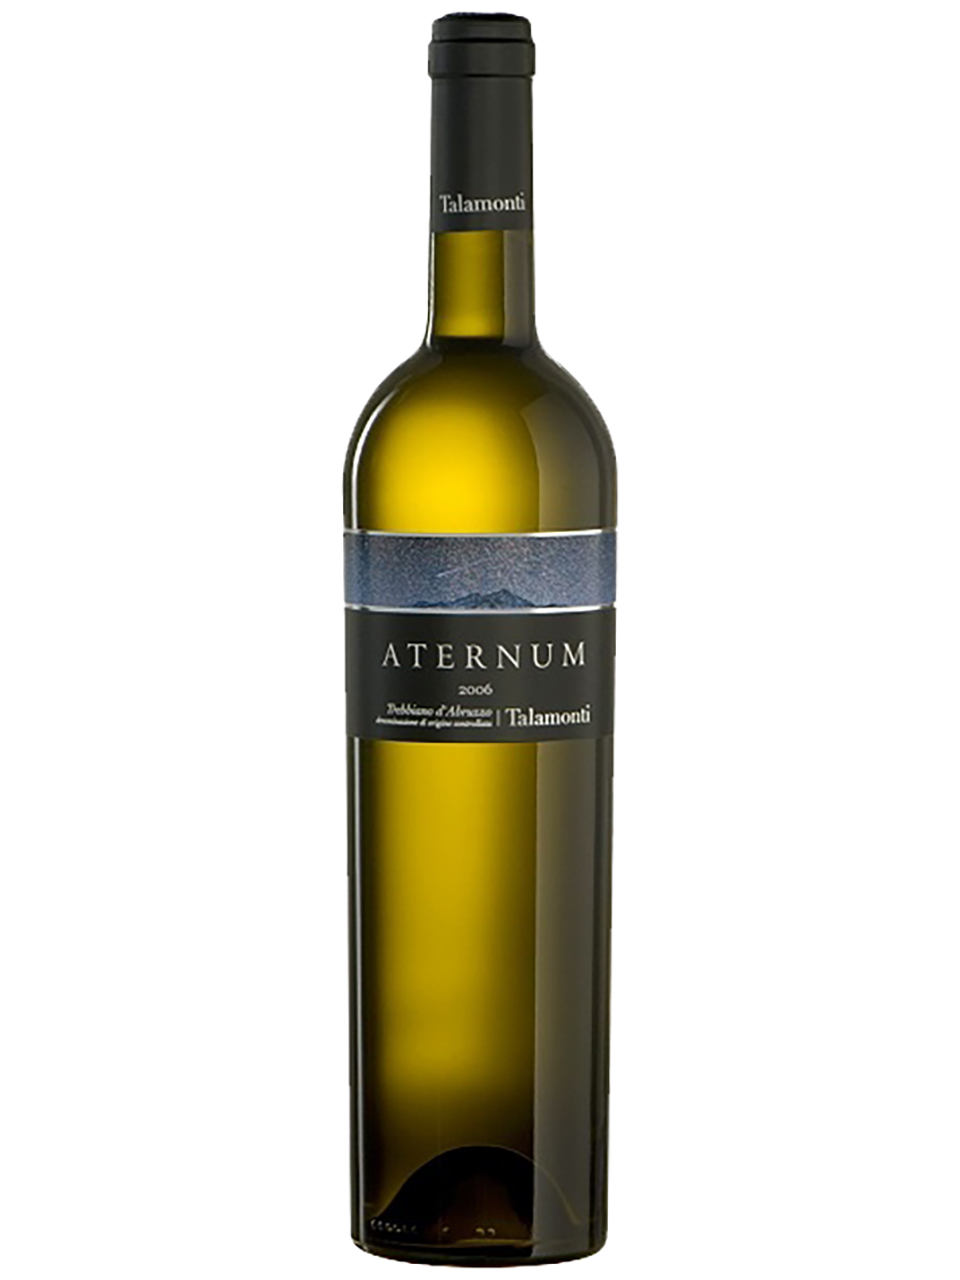 Talamonti Aternum Trebbiano d'Abruzzo DOC